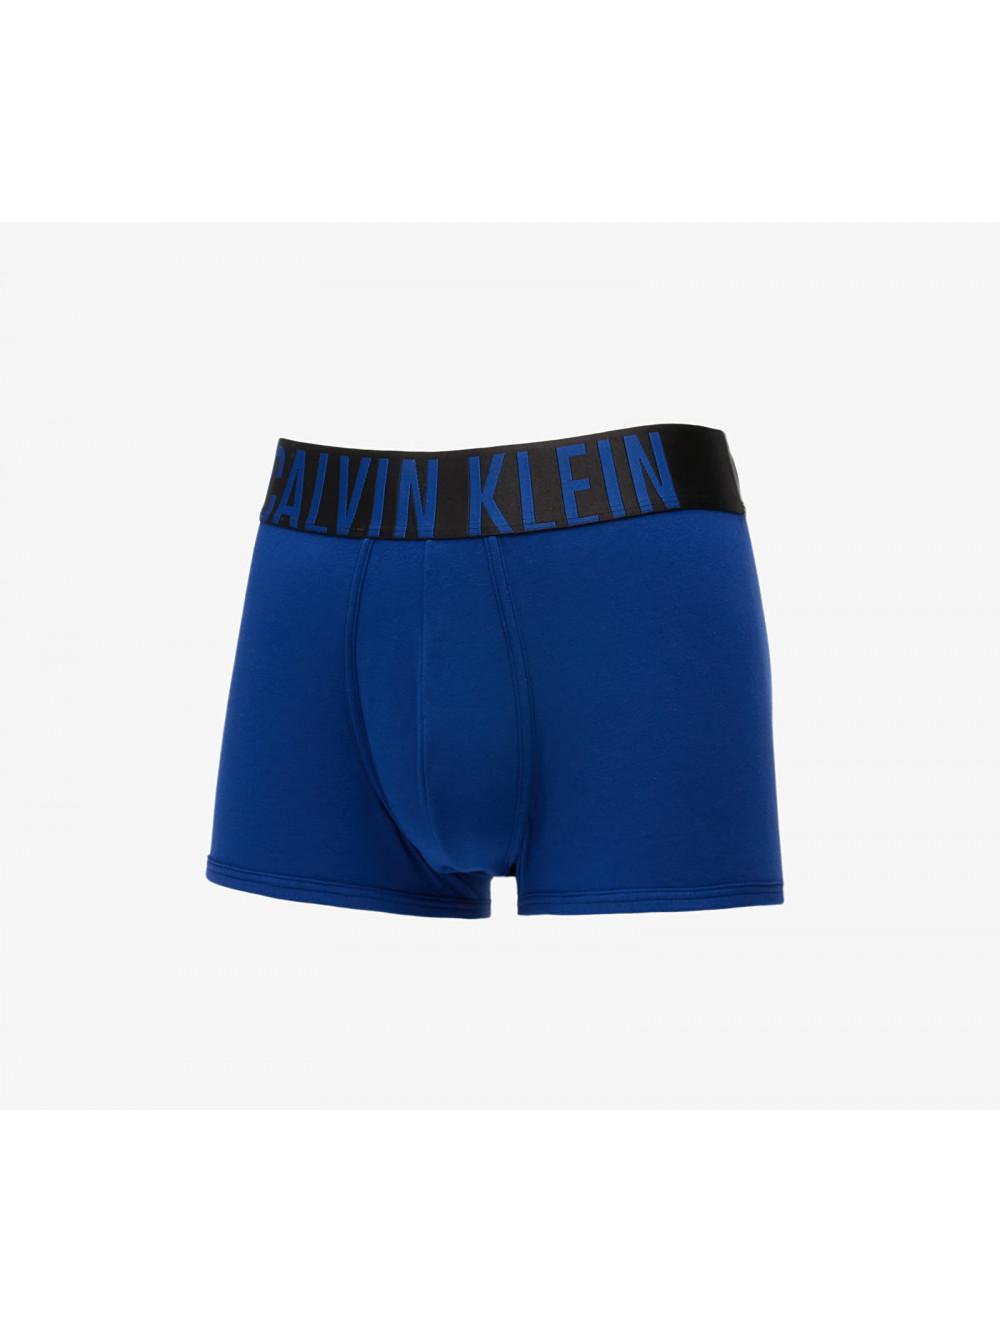 Pánske boxerky Calvin Klein Intense Power tmavomodré